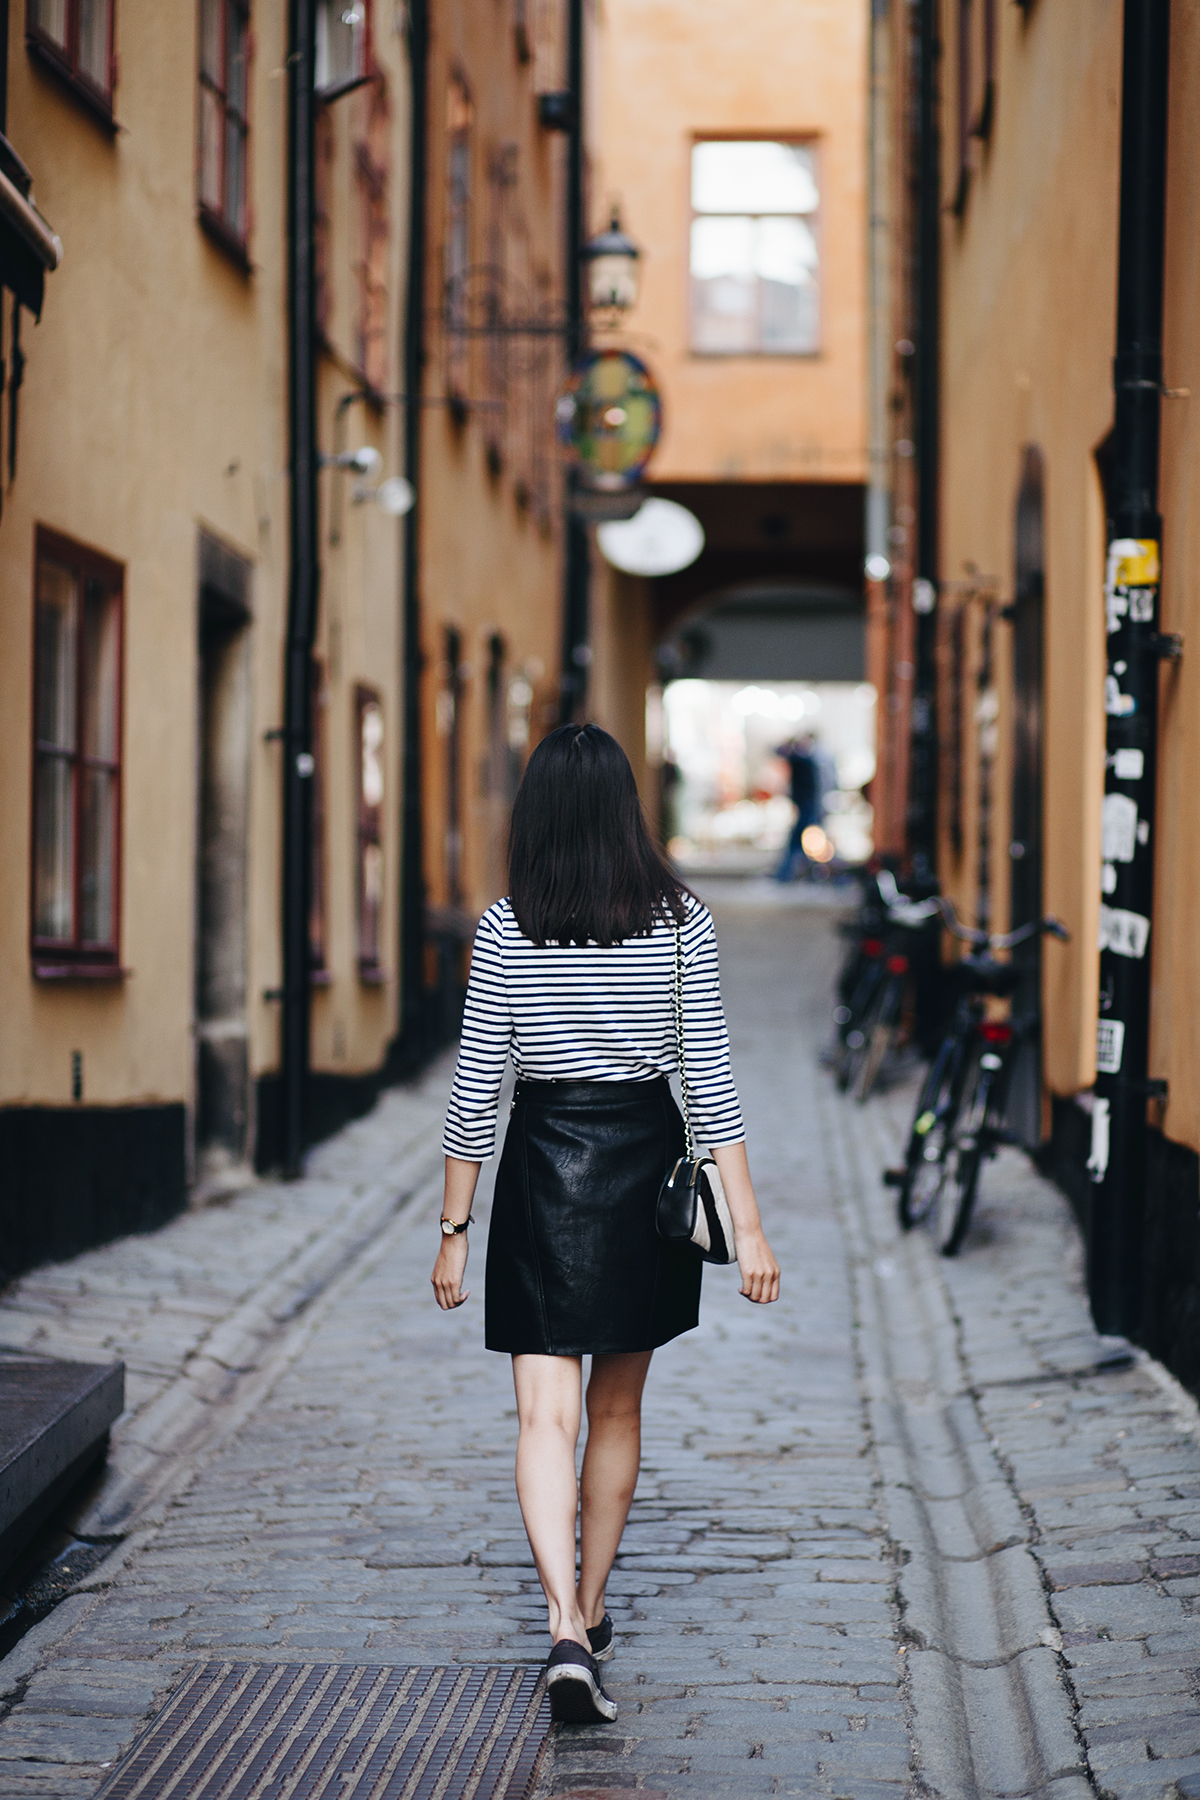 Stockholm breton stripes